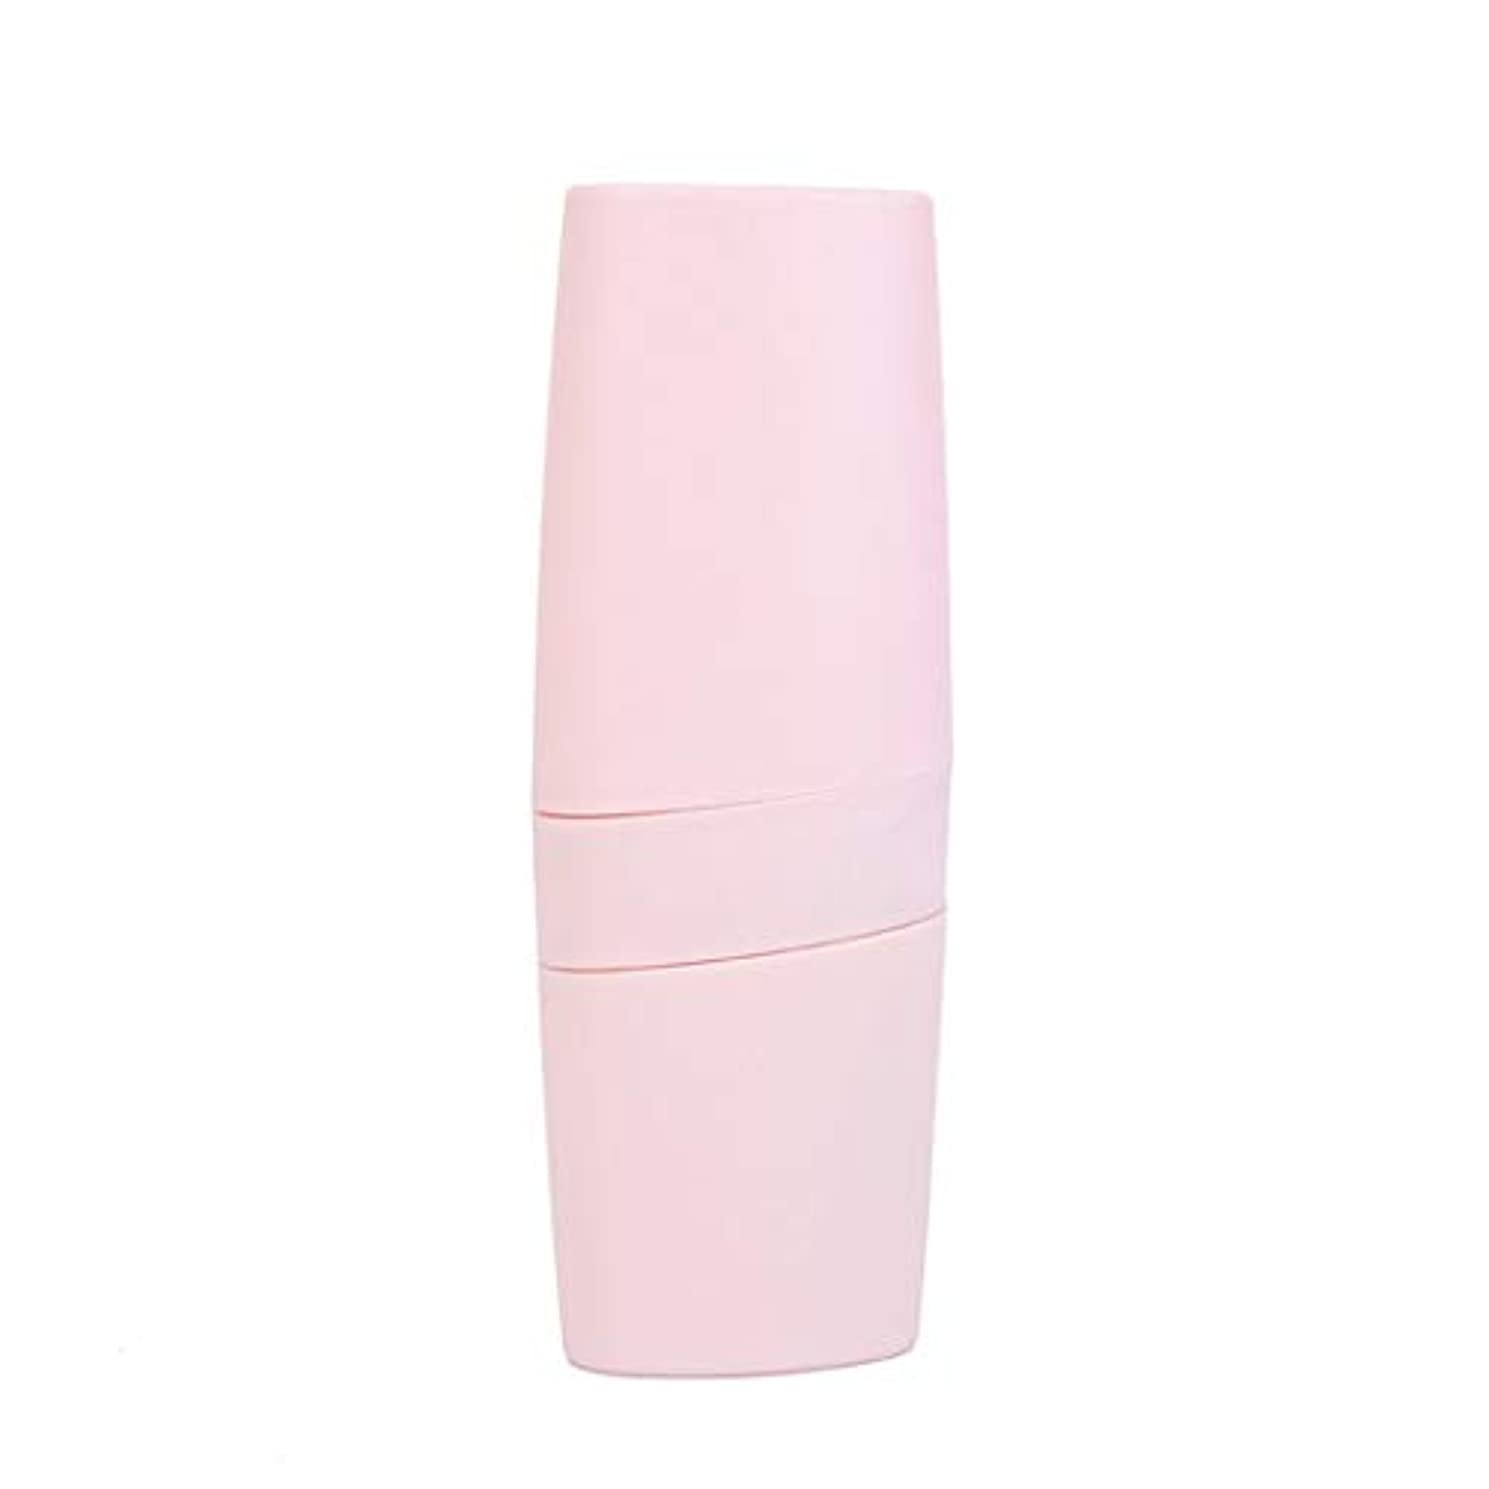 Swiftgood 携帯用歯ブラシケース通気性歯磨き粉プラスチック収納ボックス大型歯ブラシケース